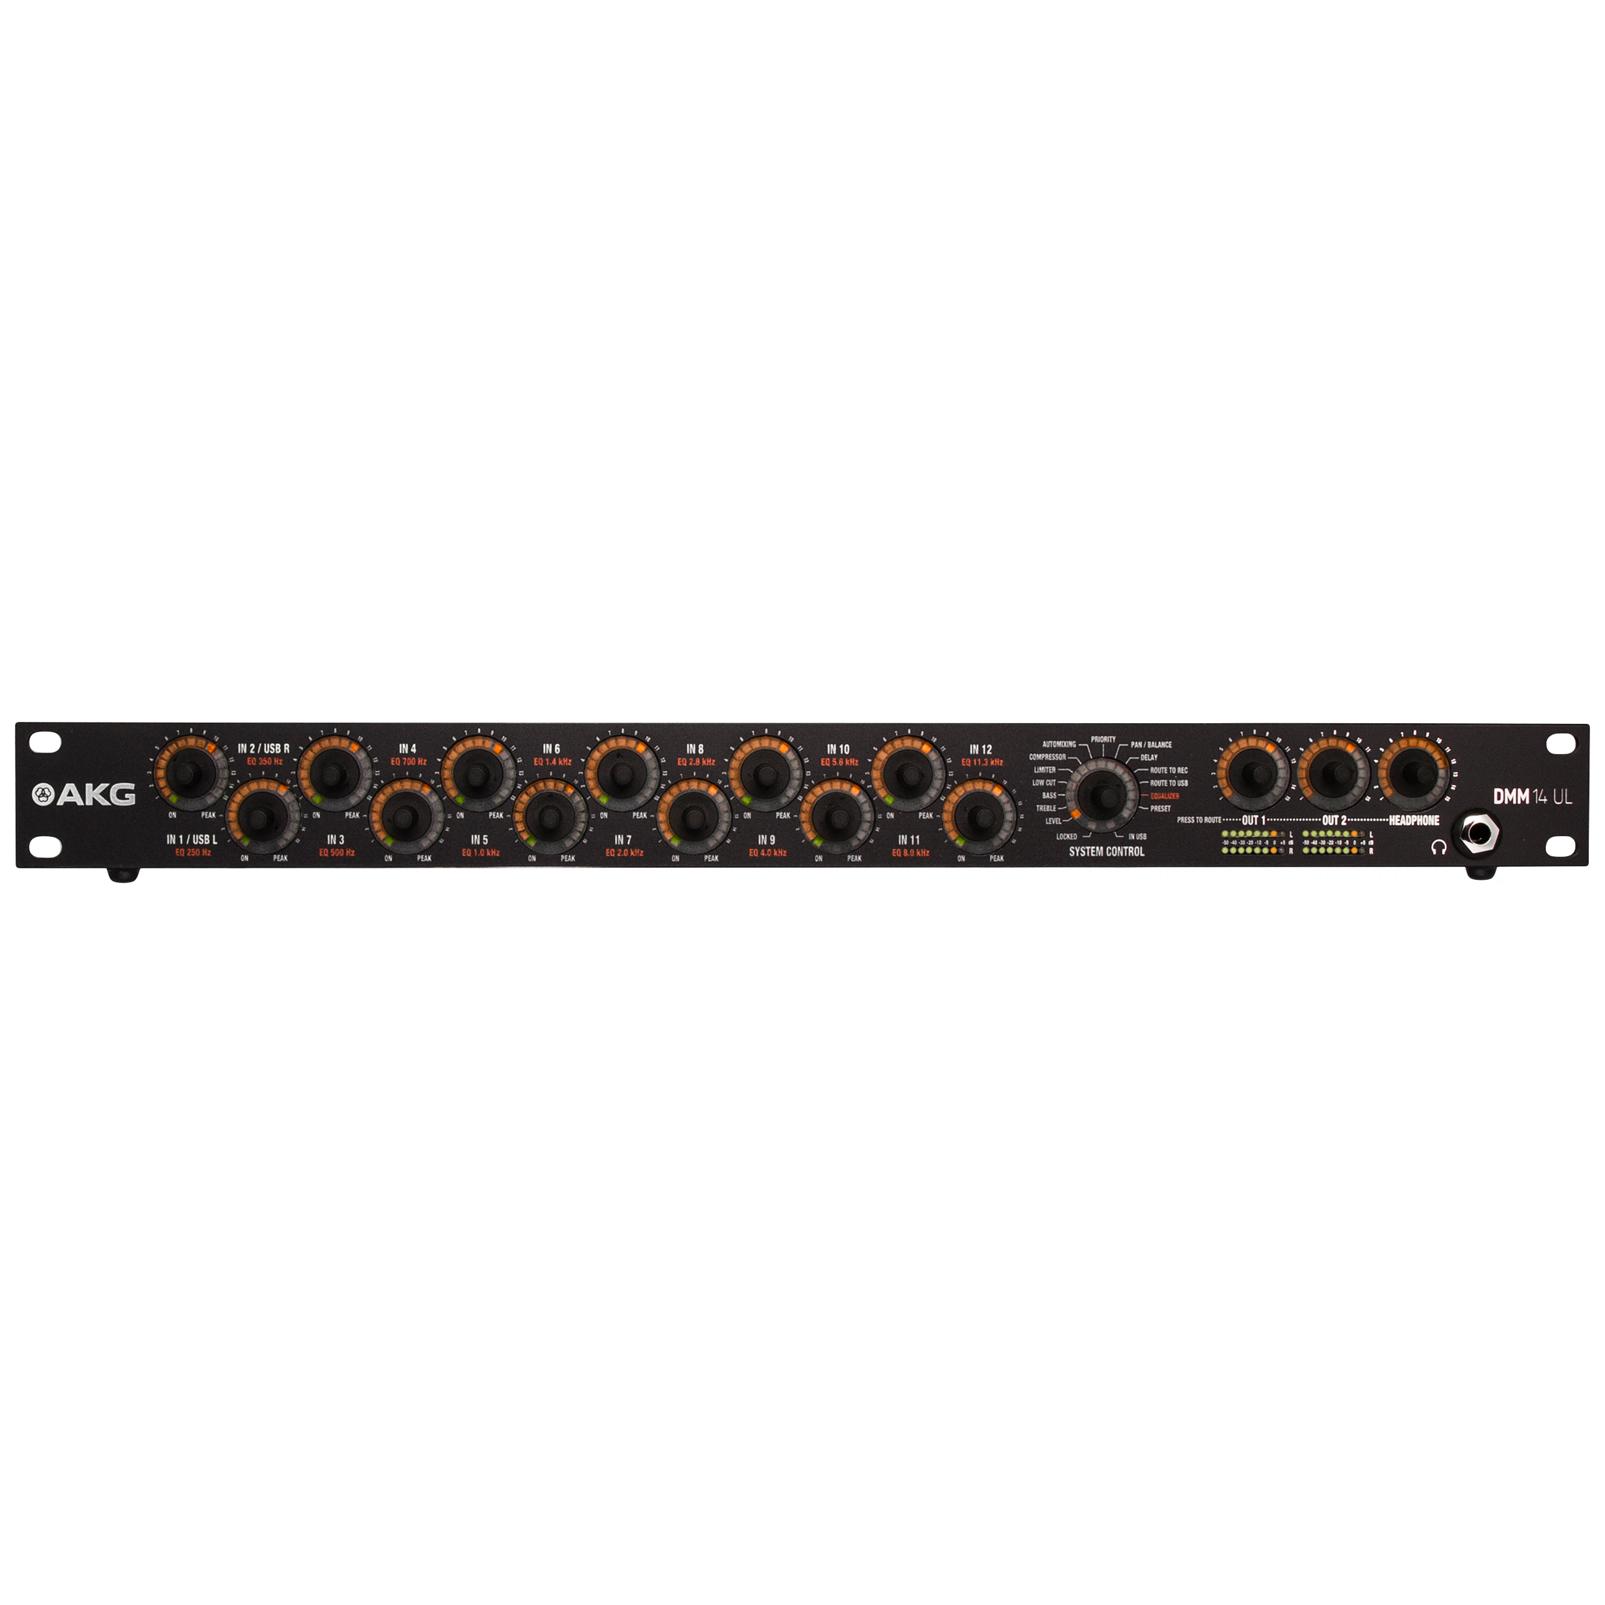 DMM14 UL - Black - Reference digital automatic microphone mixer w/LAN interface via Ethernet - Hero